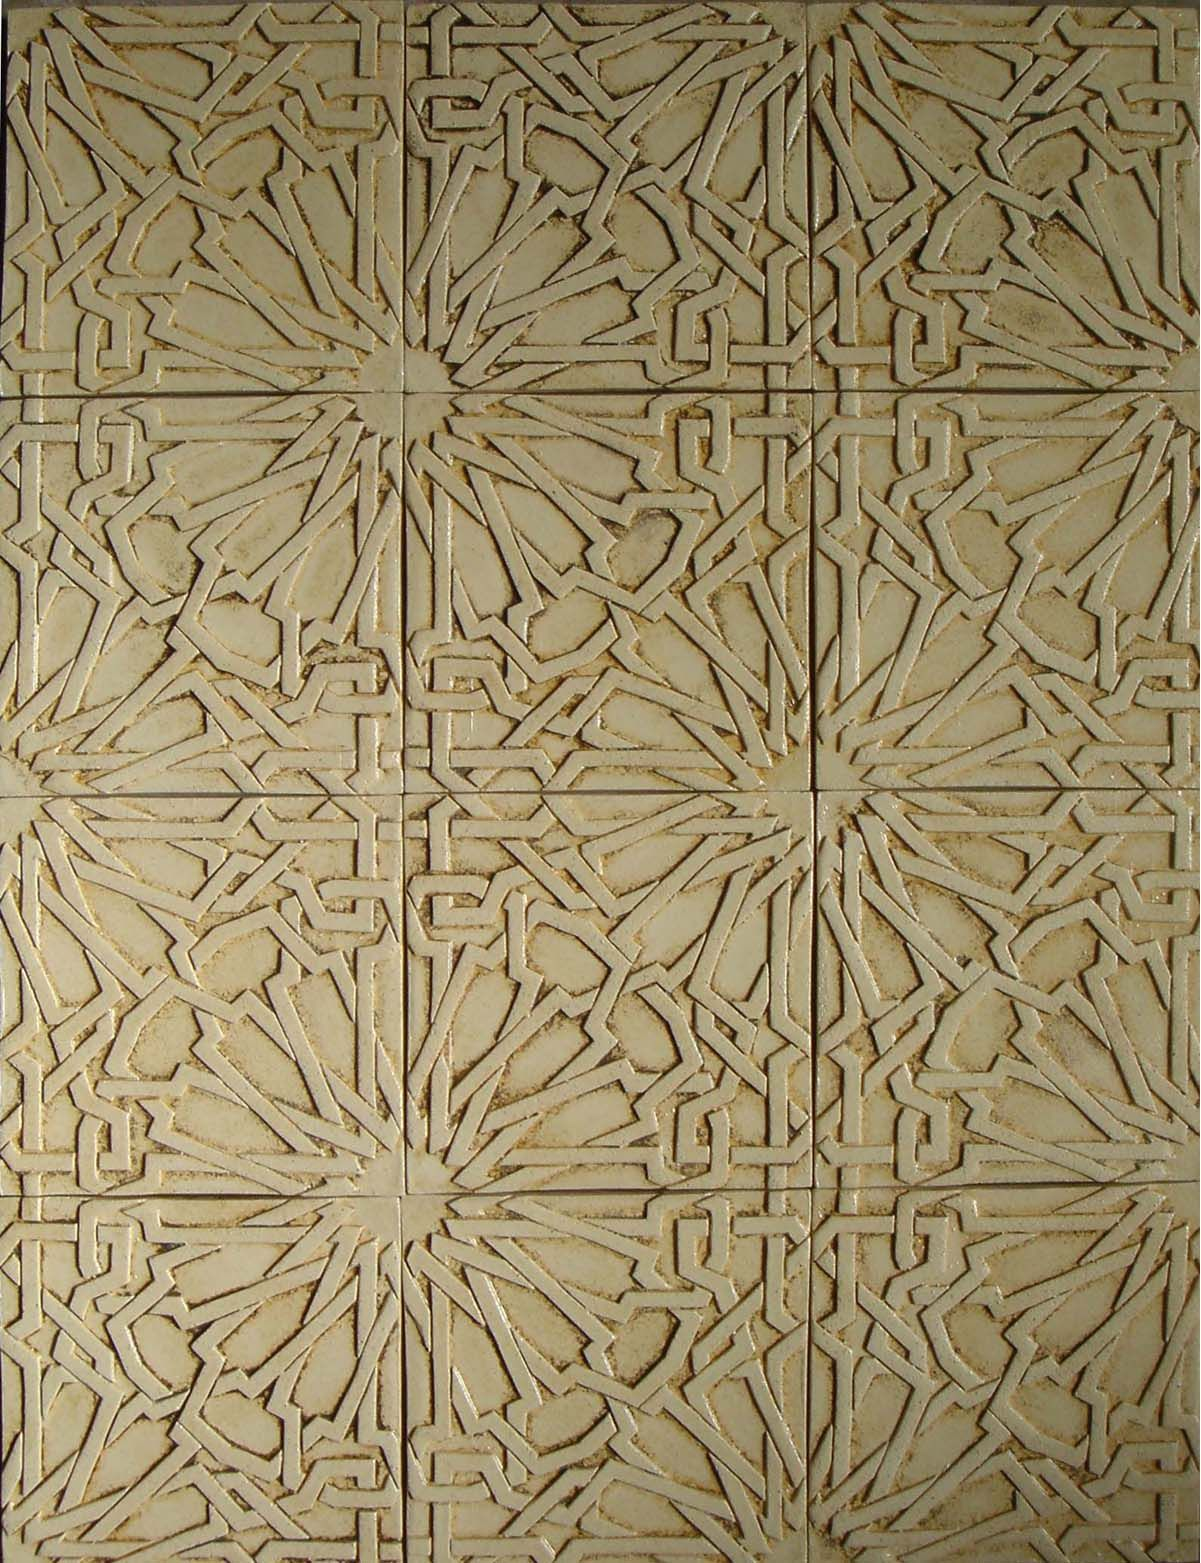 Intricate, interlocking gold tile pattern. #CCC | It's all ...